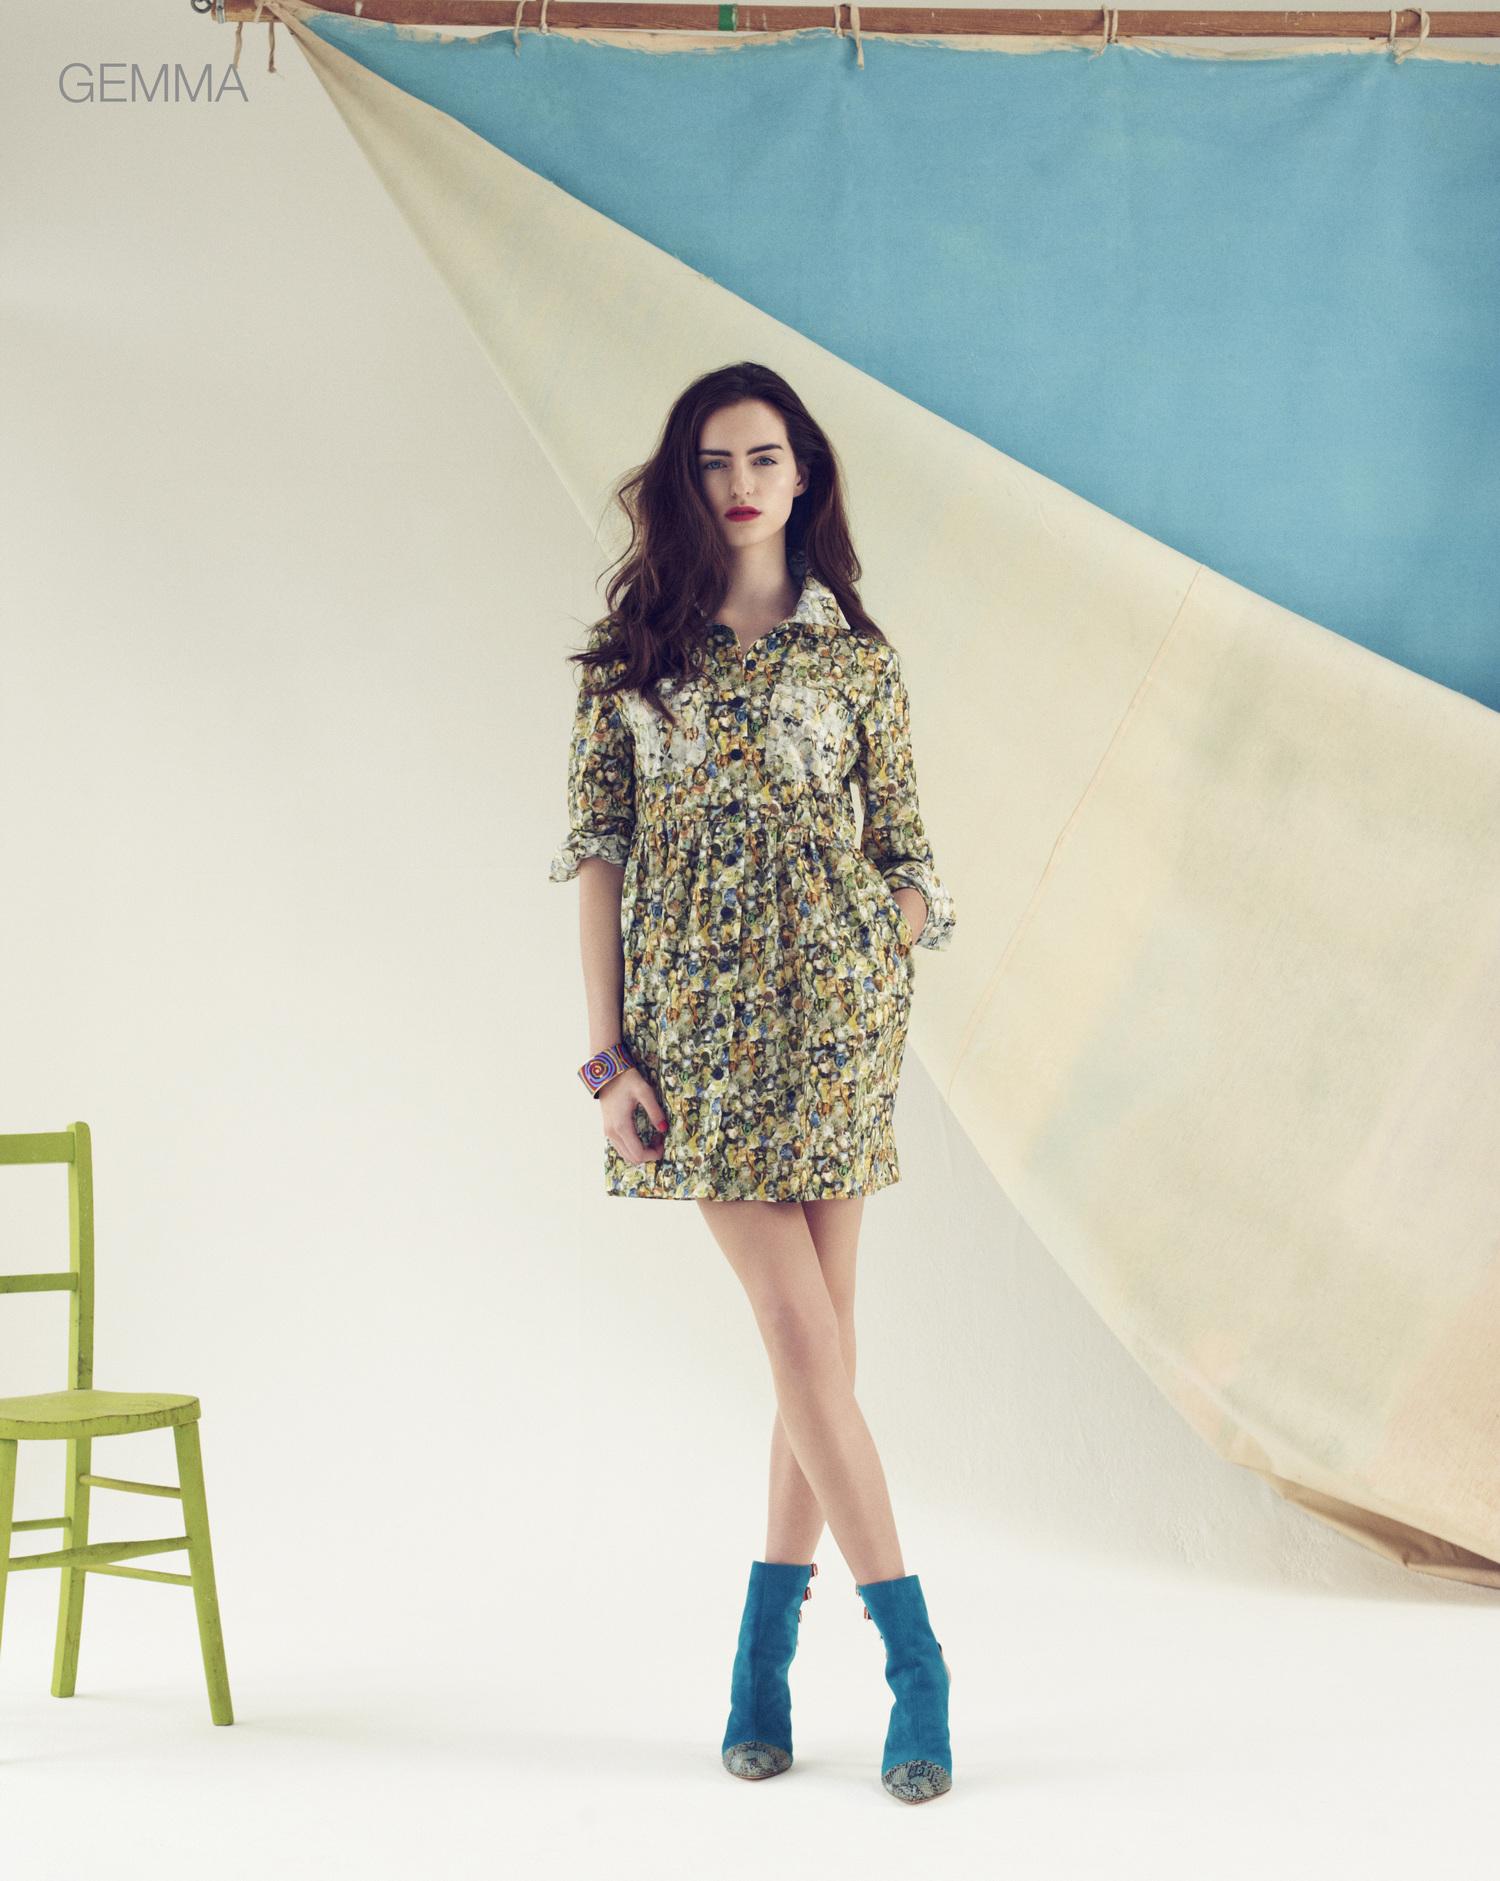 Ellie Lines Gemma dress